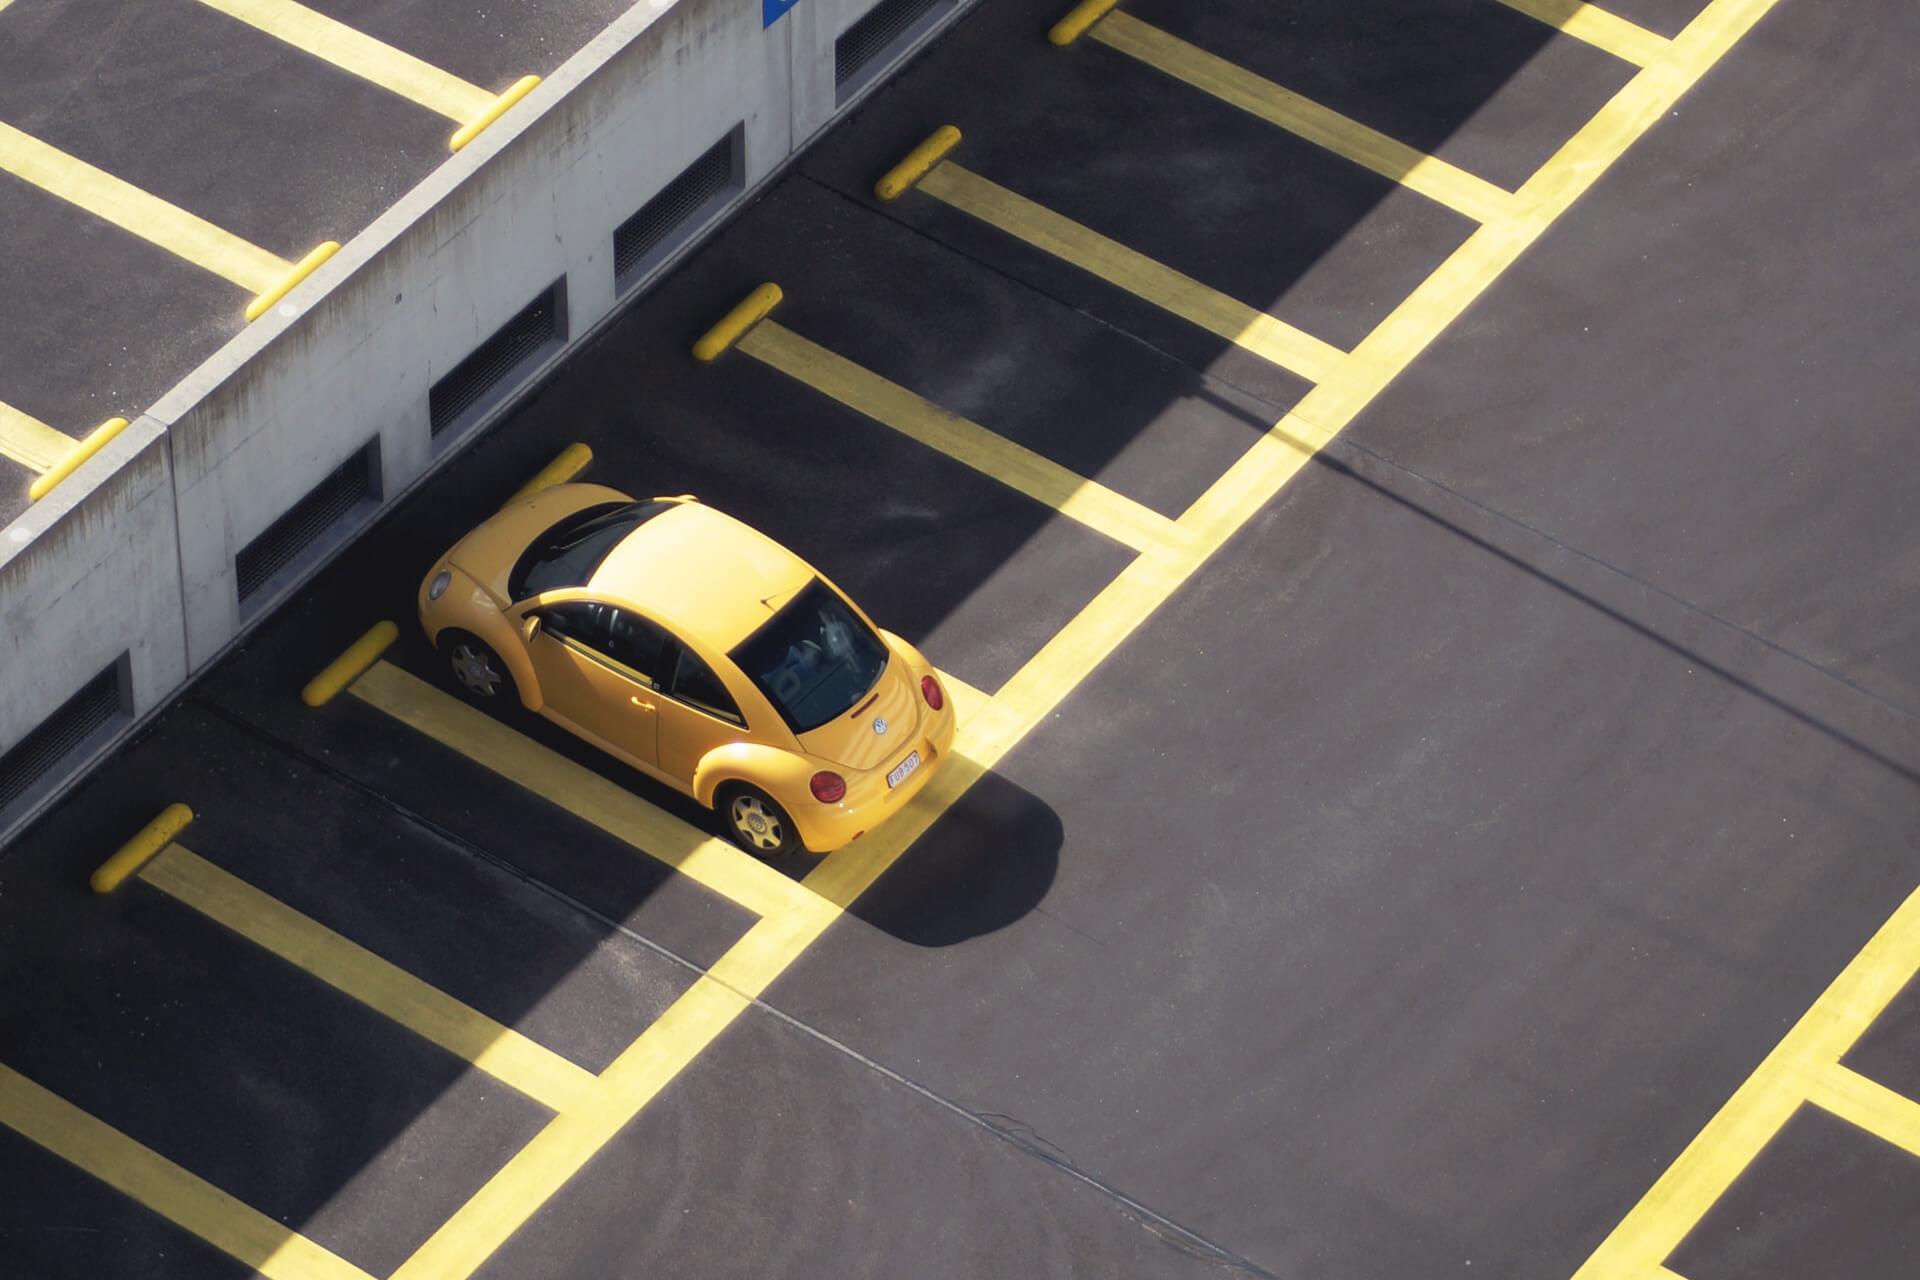 Car Park with Yellow Volkswagen Beetle